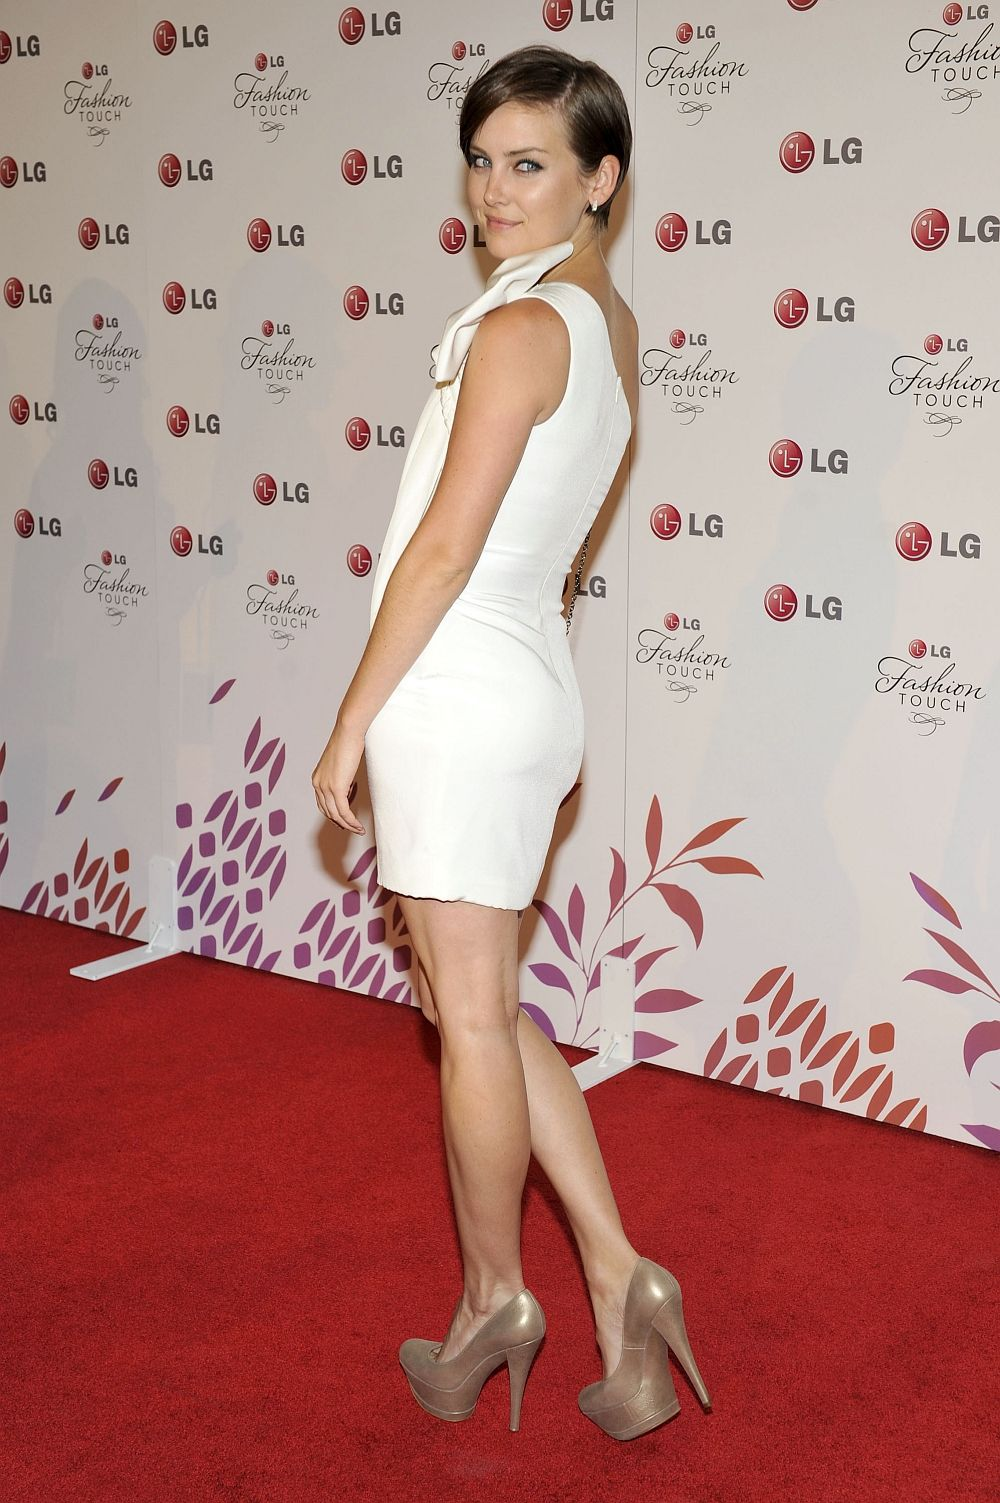 Hot Photos Of Jessica Stroup  Nude Jessica Stroup - Barnorama-9717